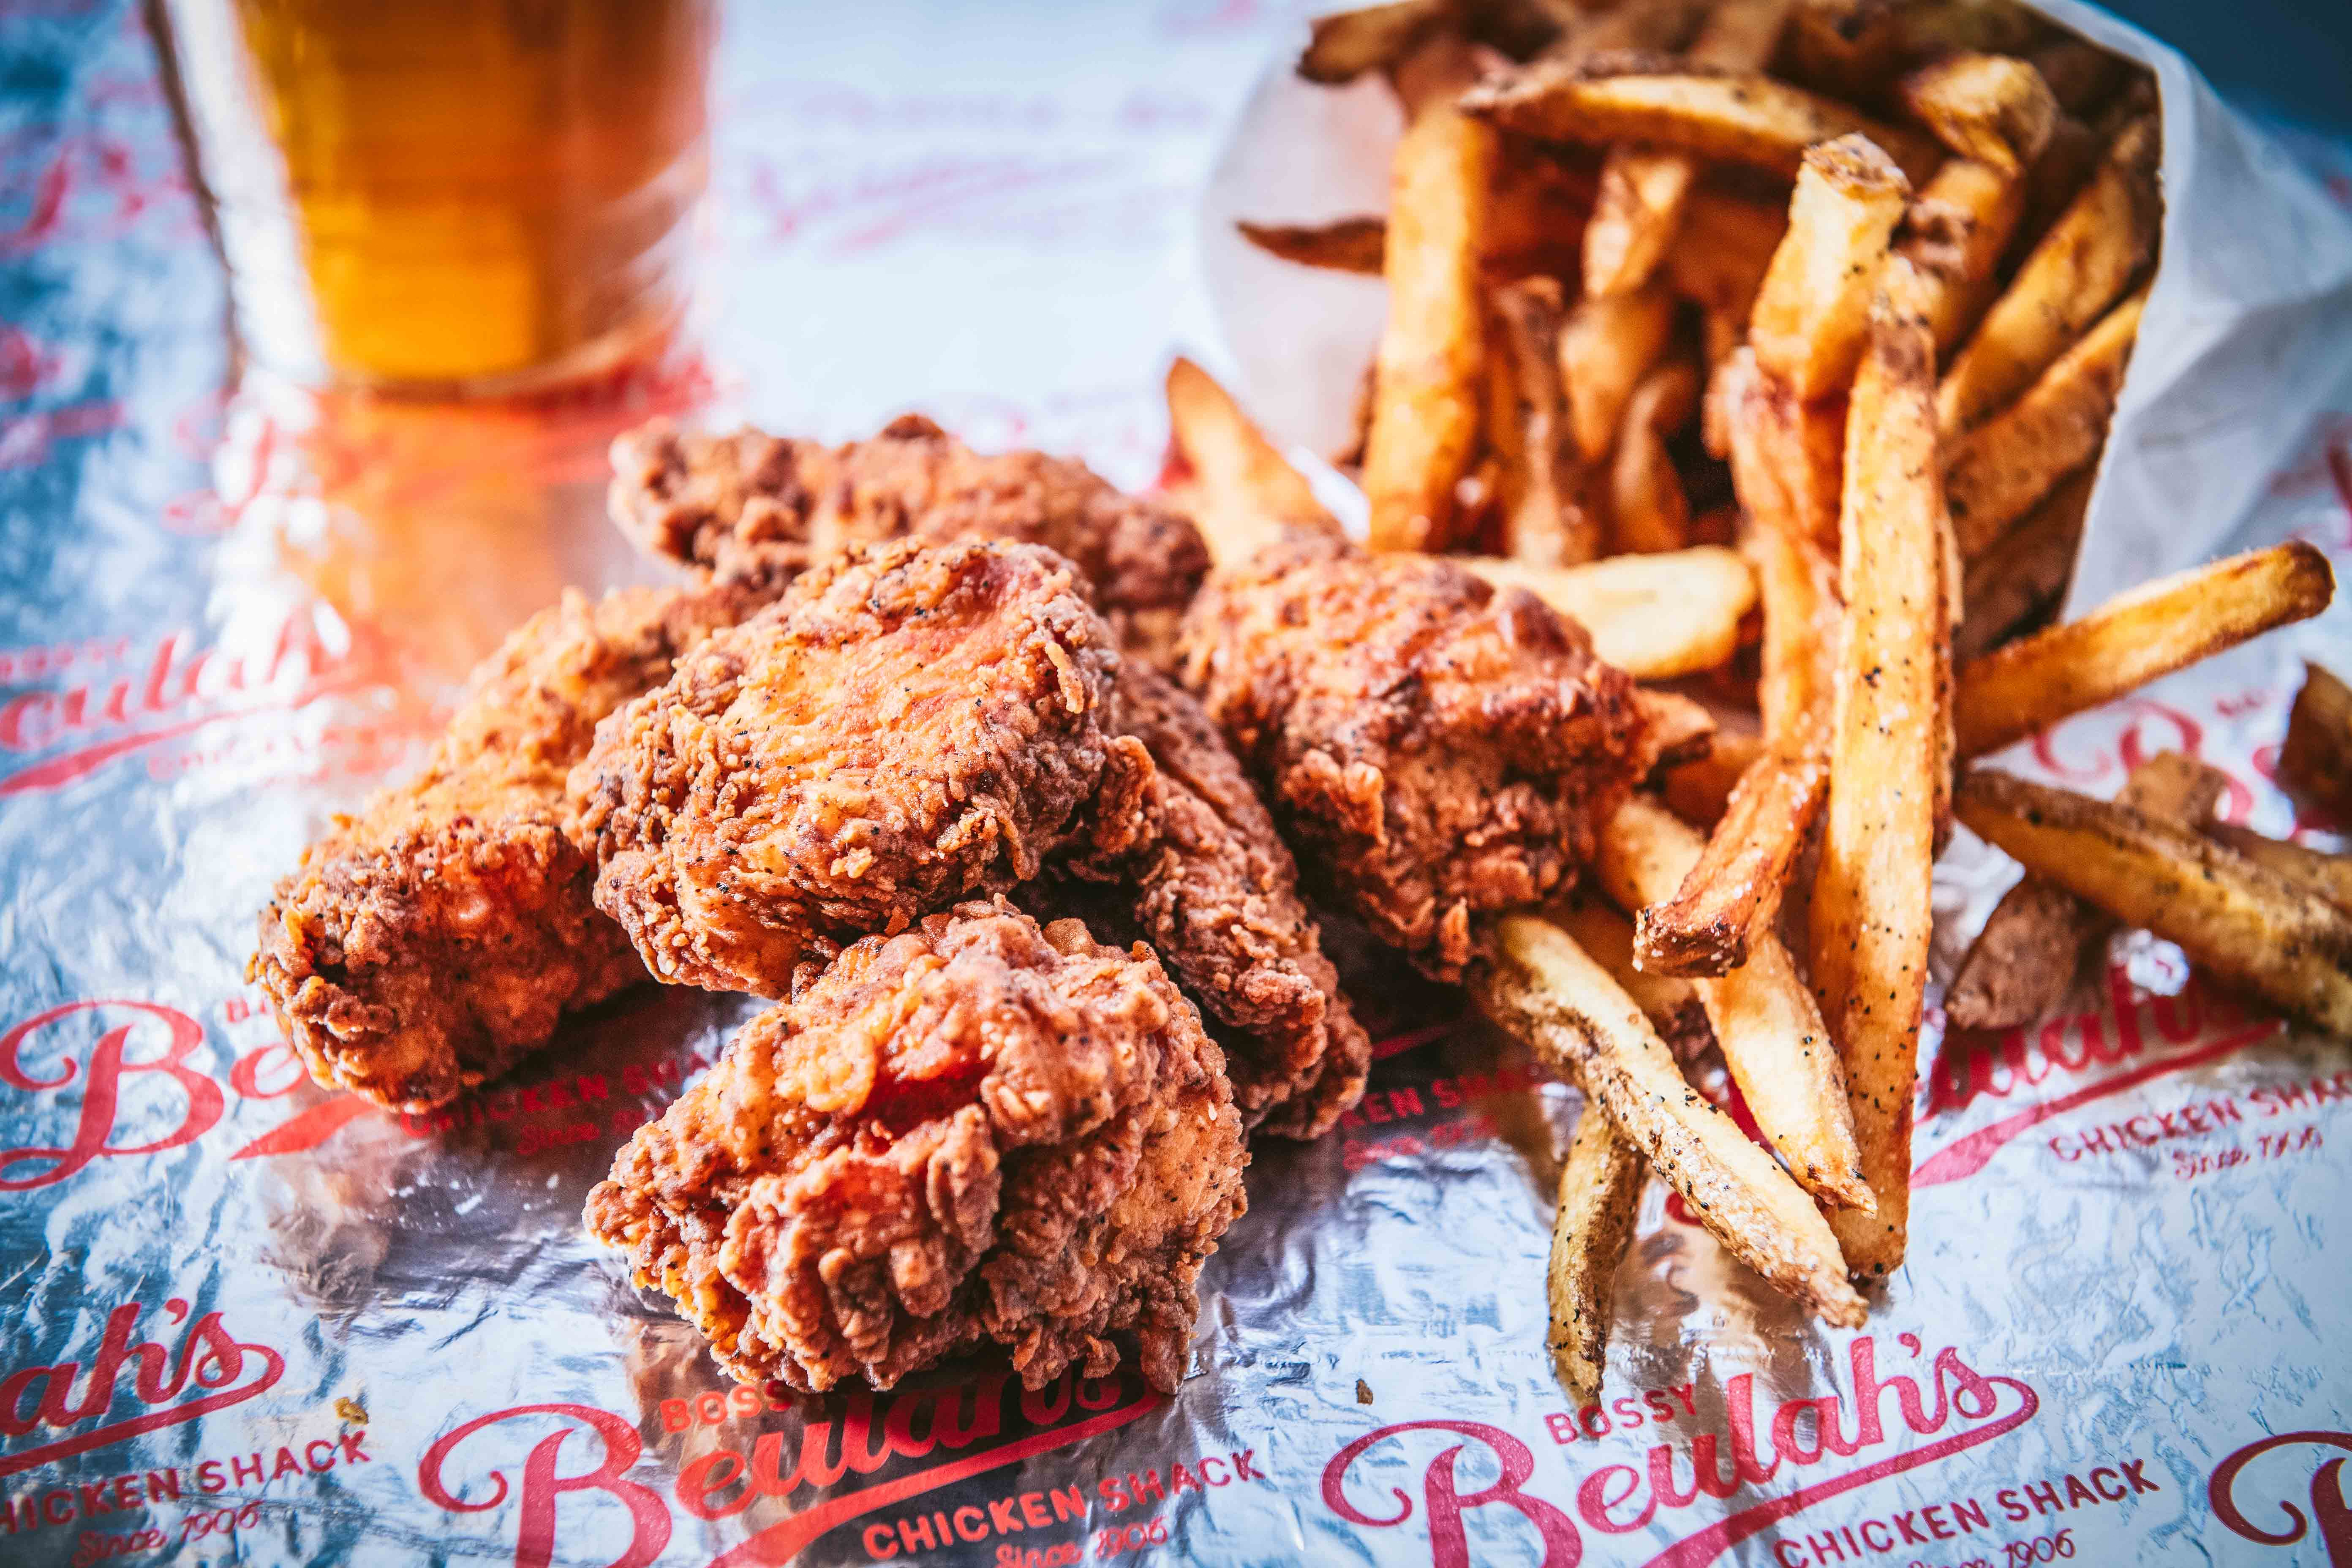 Bossy Bites at Bossy Beulah's Chicken Shack Charlotte NC